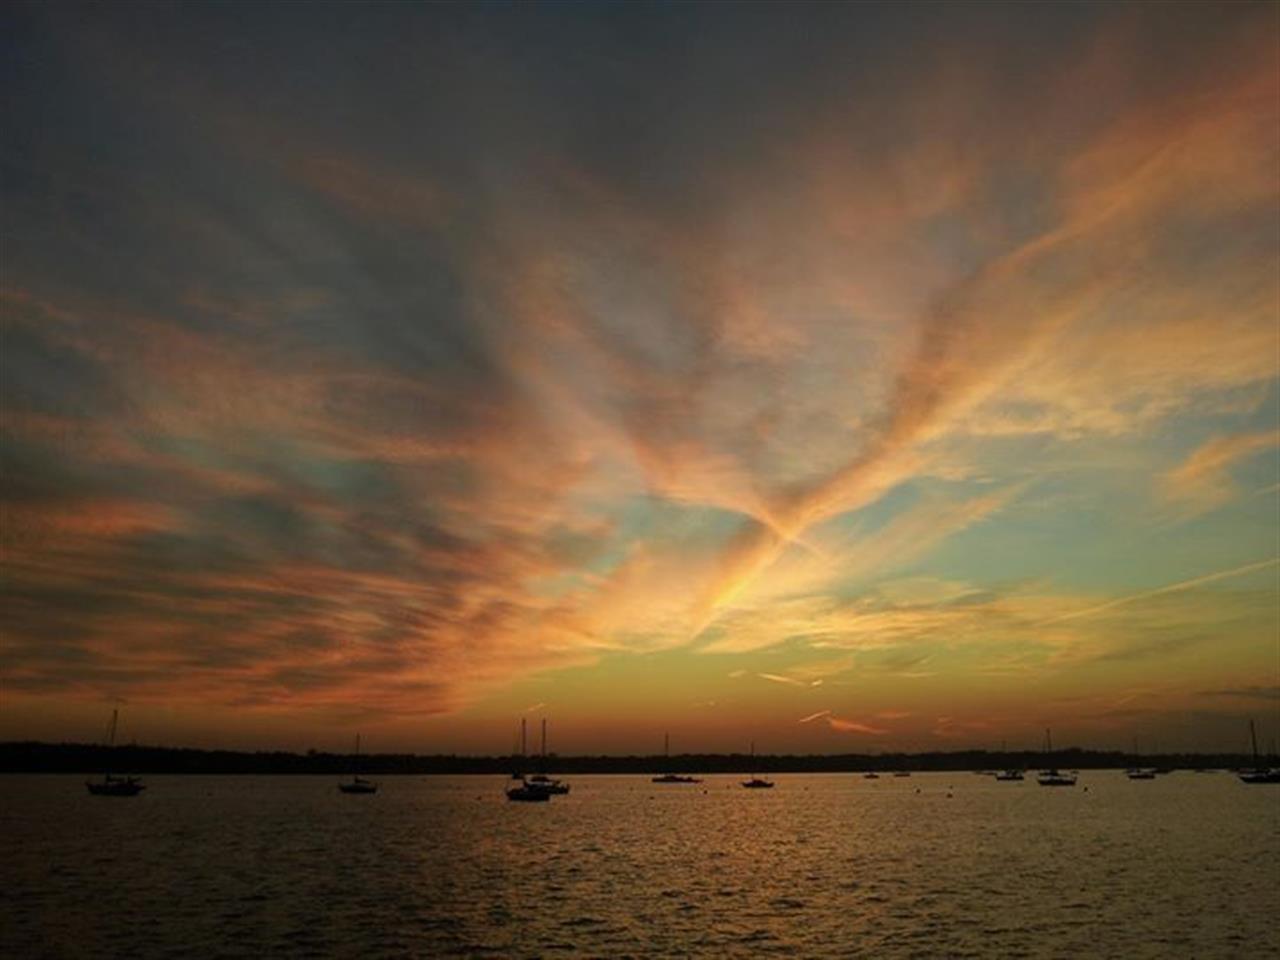 Sunset on Manhasset Bay overlooking Sands Point in Port Washington, NY.